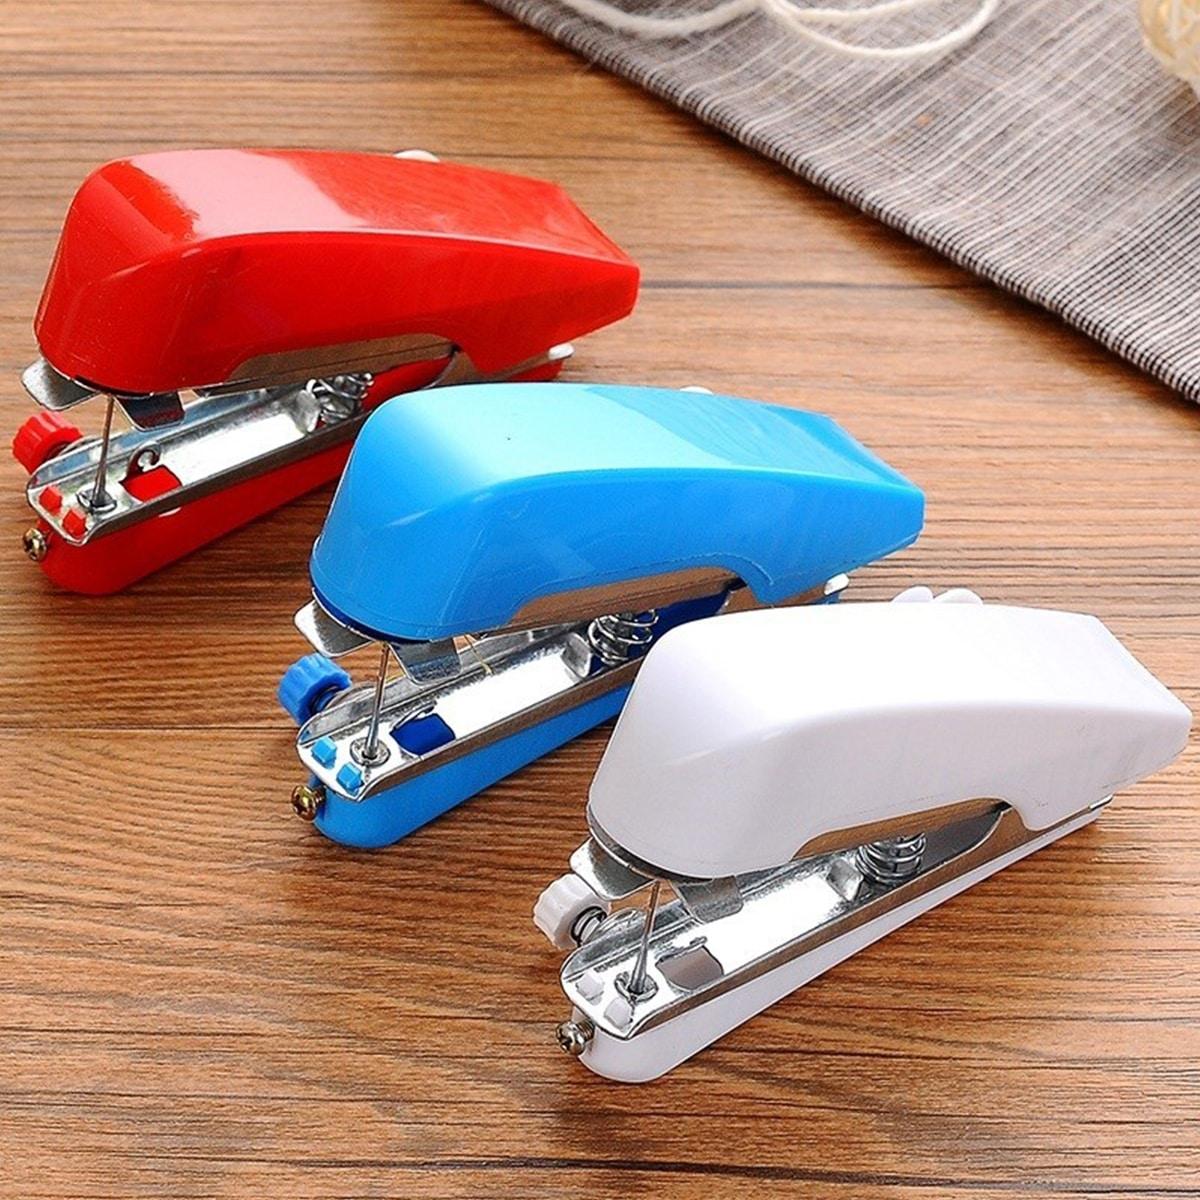 Willekeurige kleur mini handheld naaimachine 1pc